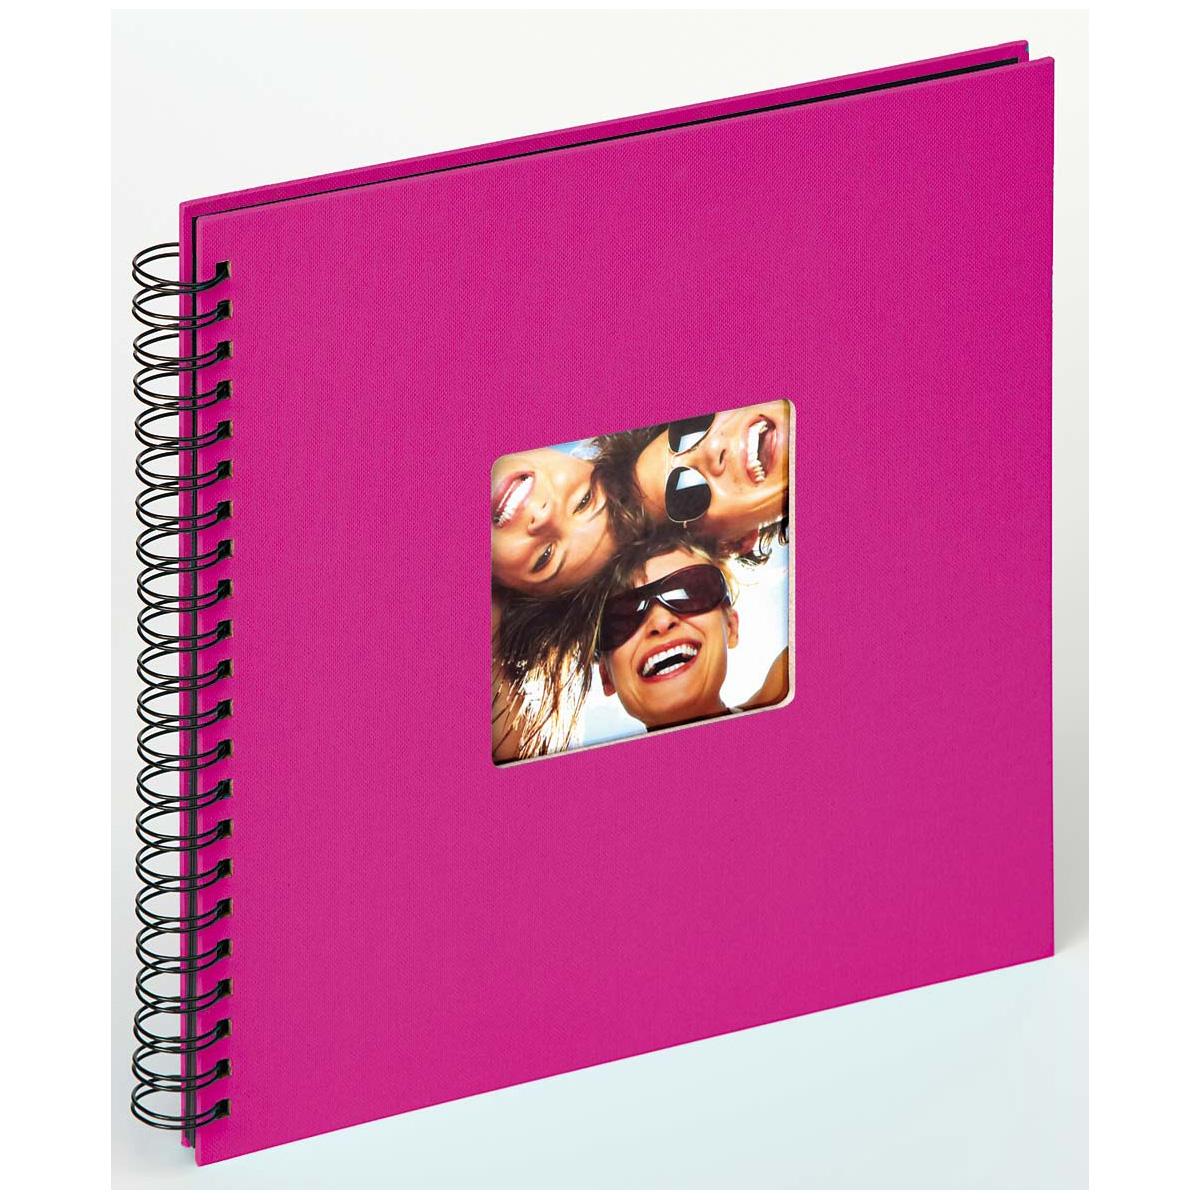 Pinkes Fotoalbum mit Spiralbindung